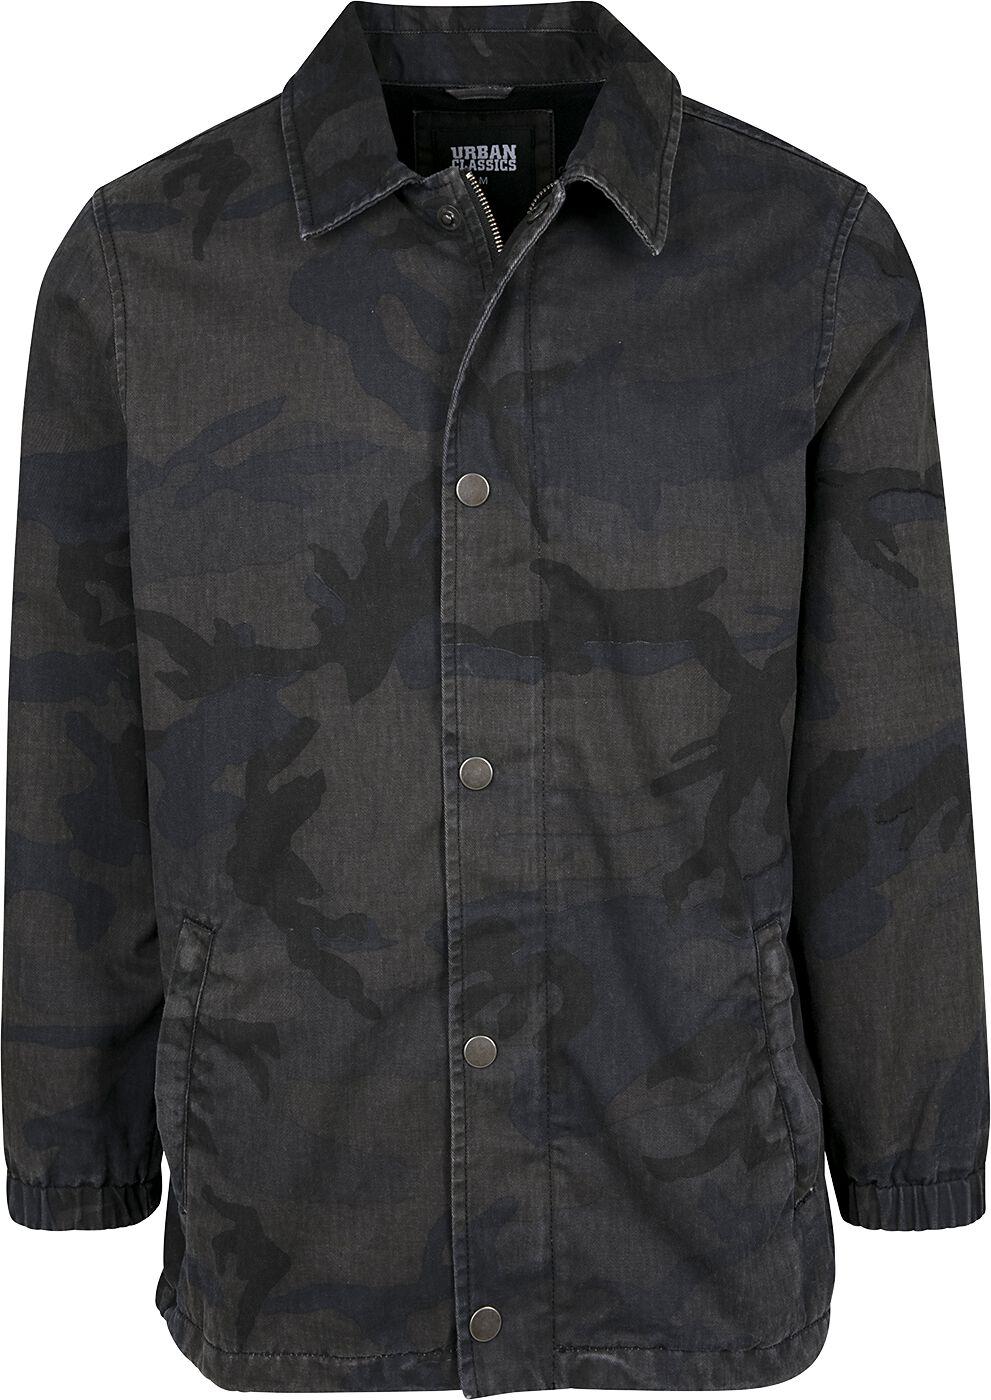 Image of   Urban Classics Camo Cotton Coach Jacket Jakke mørk camo